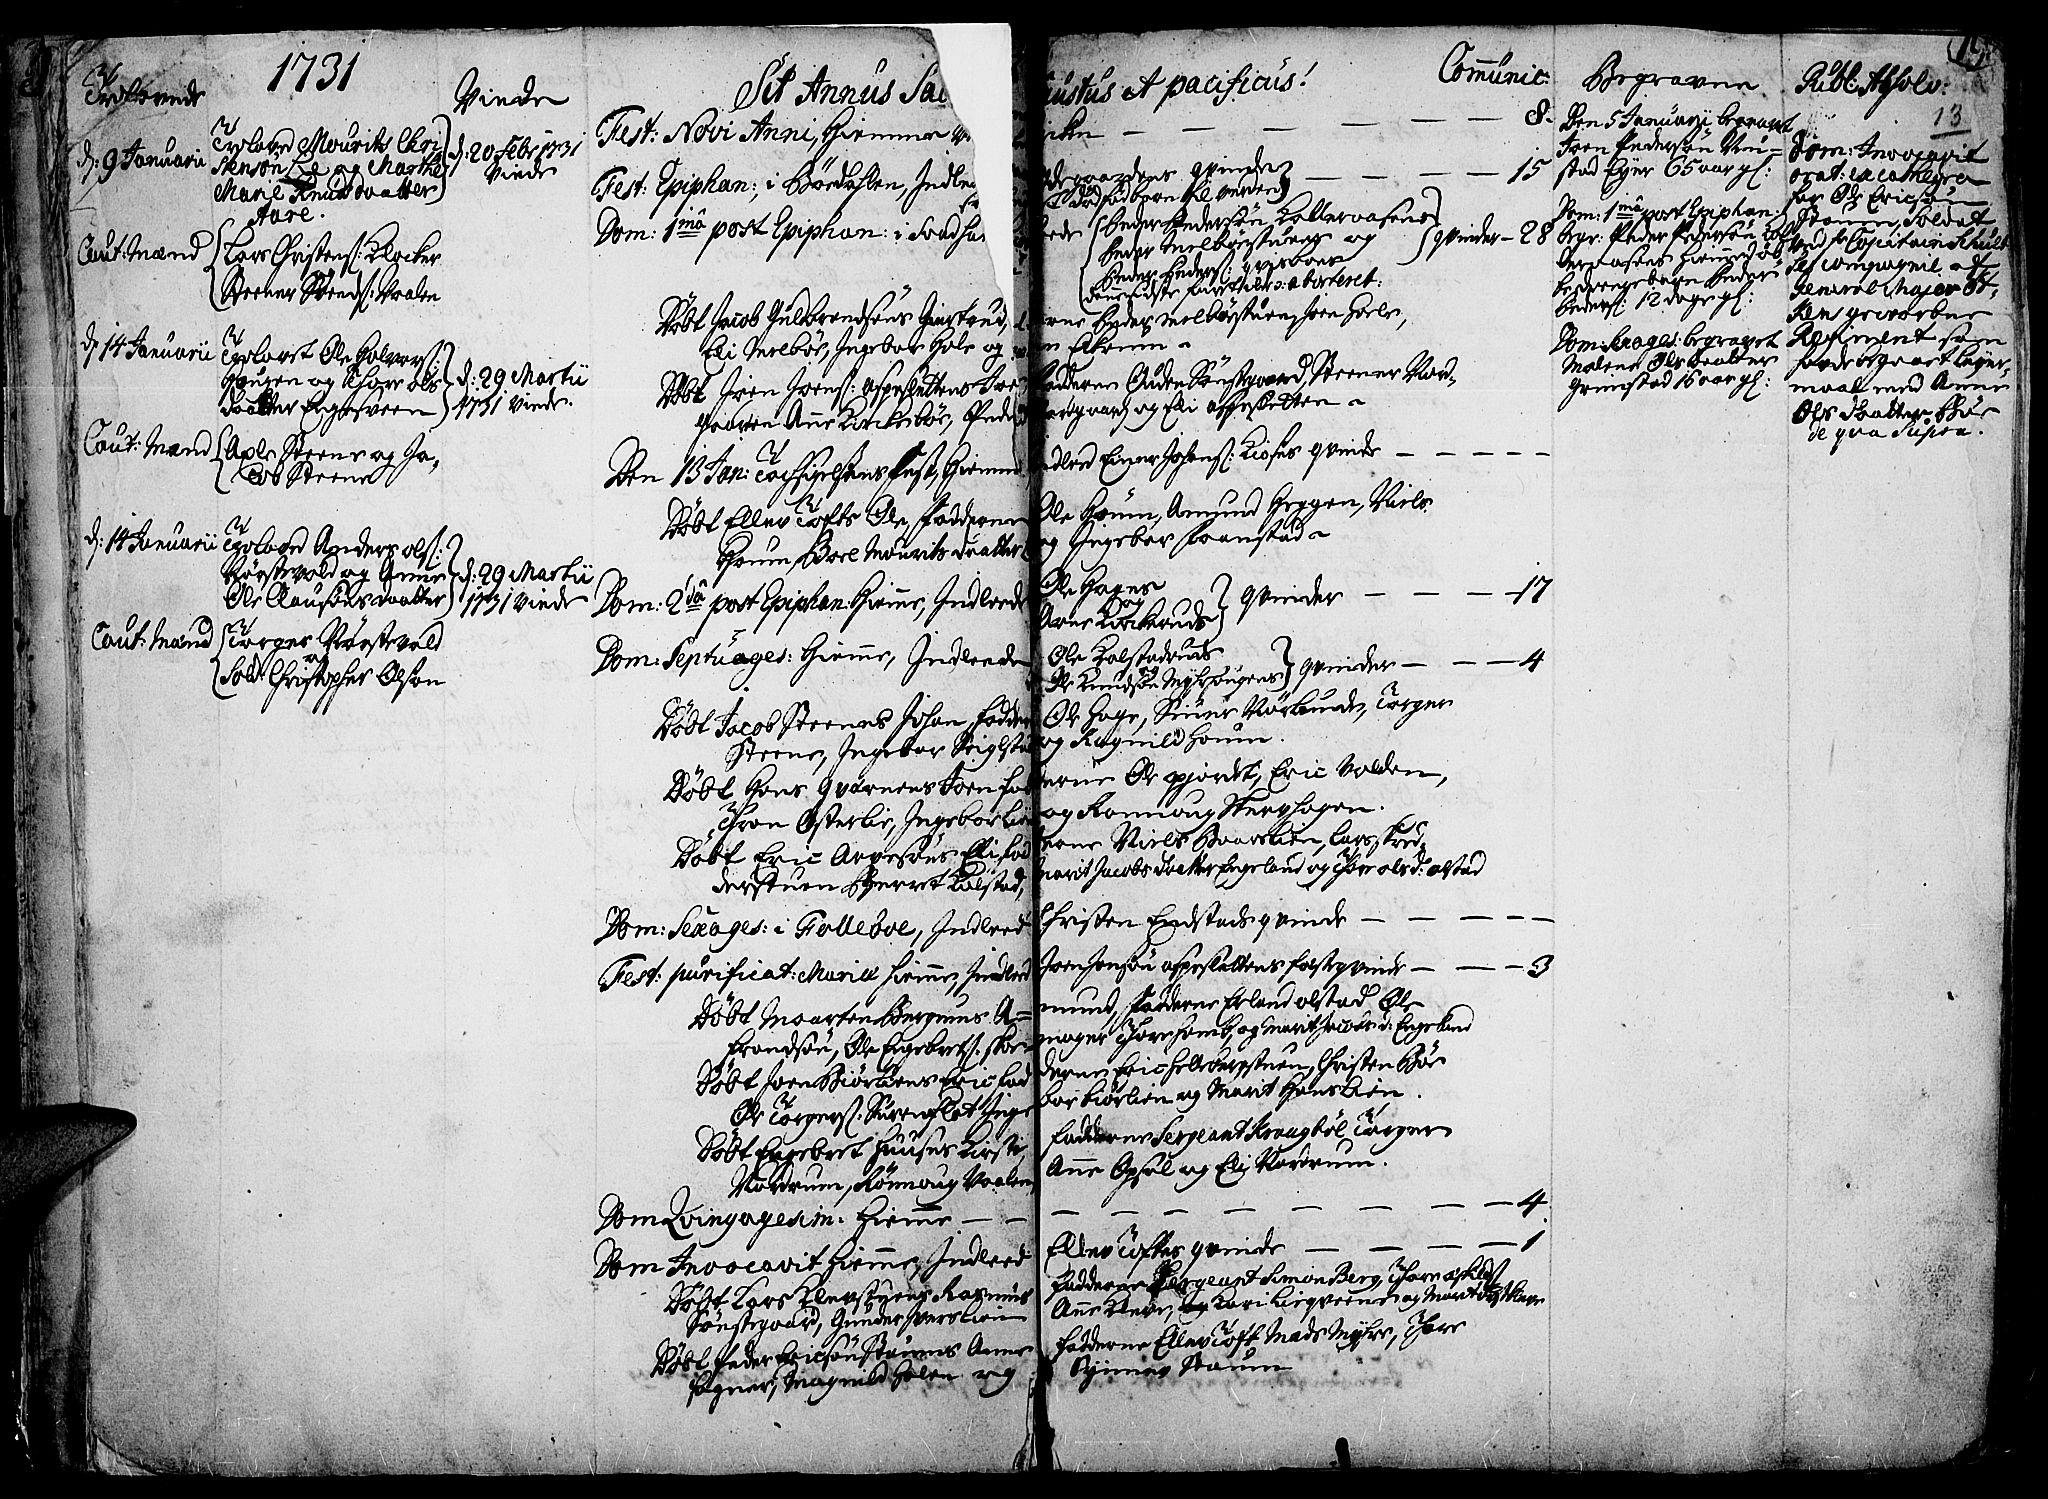 SAH, Gausdal prestekontor, Ministerialbok nr. 2, 1729-1757, s. 13